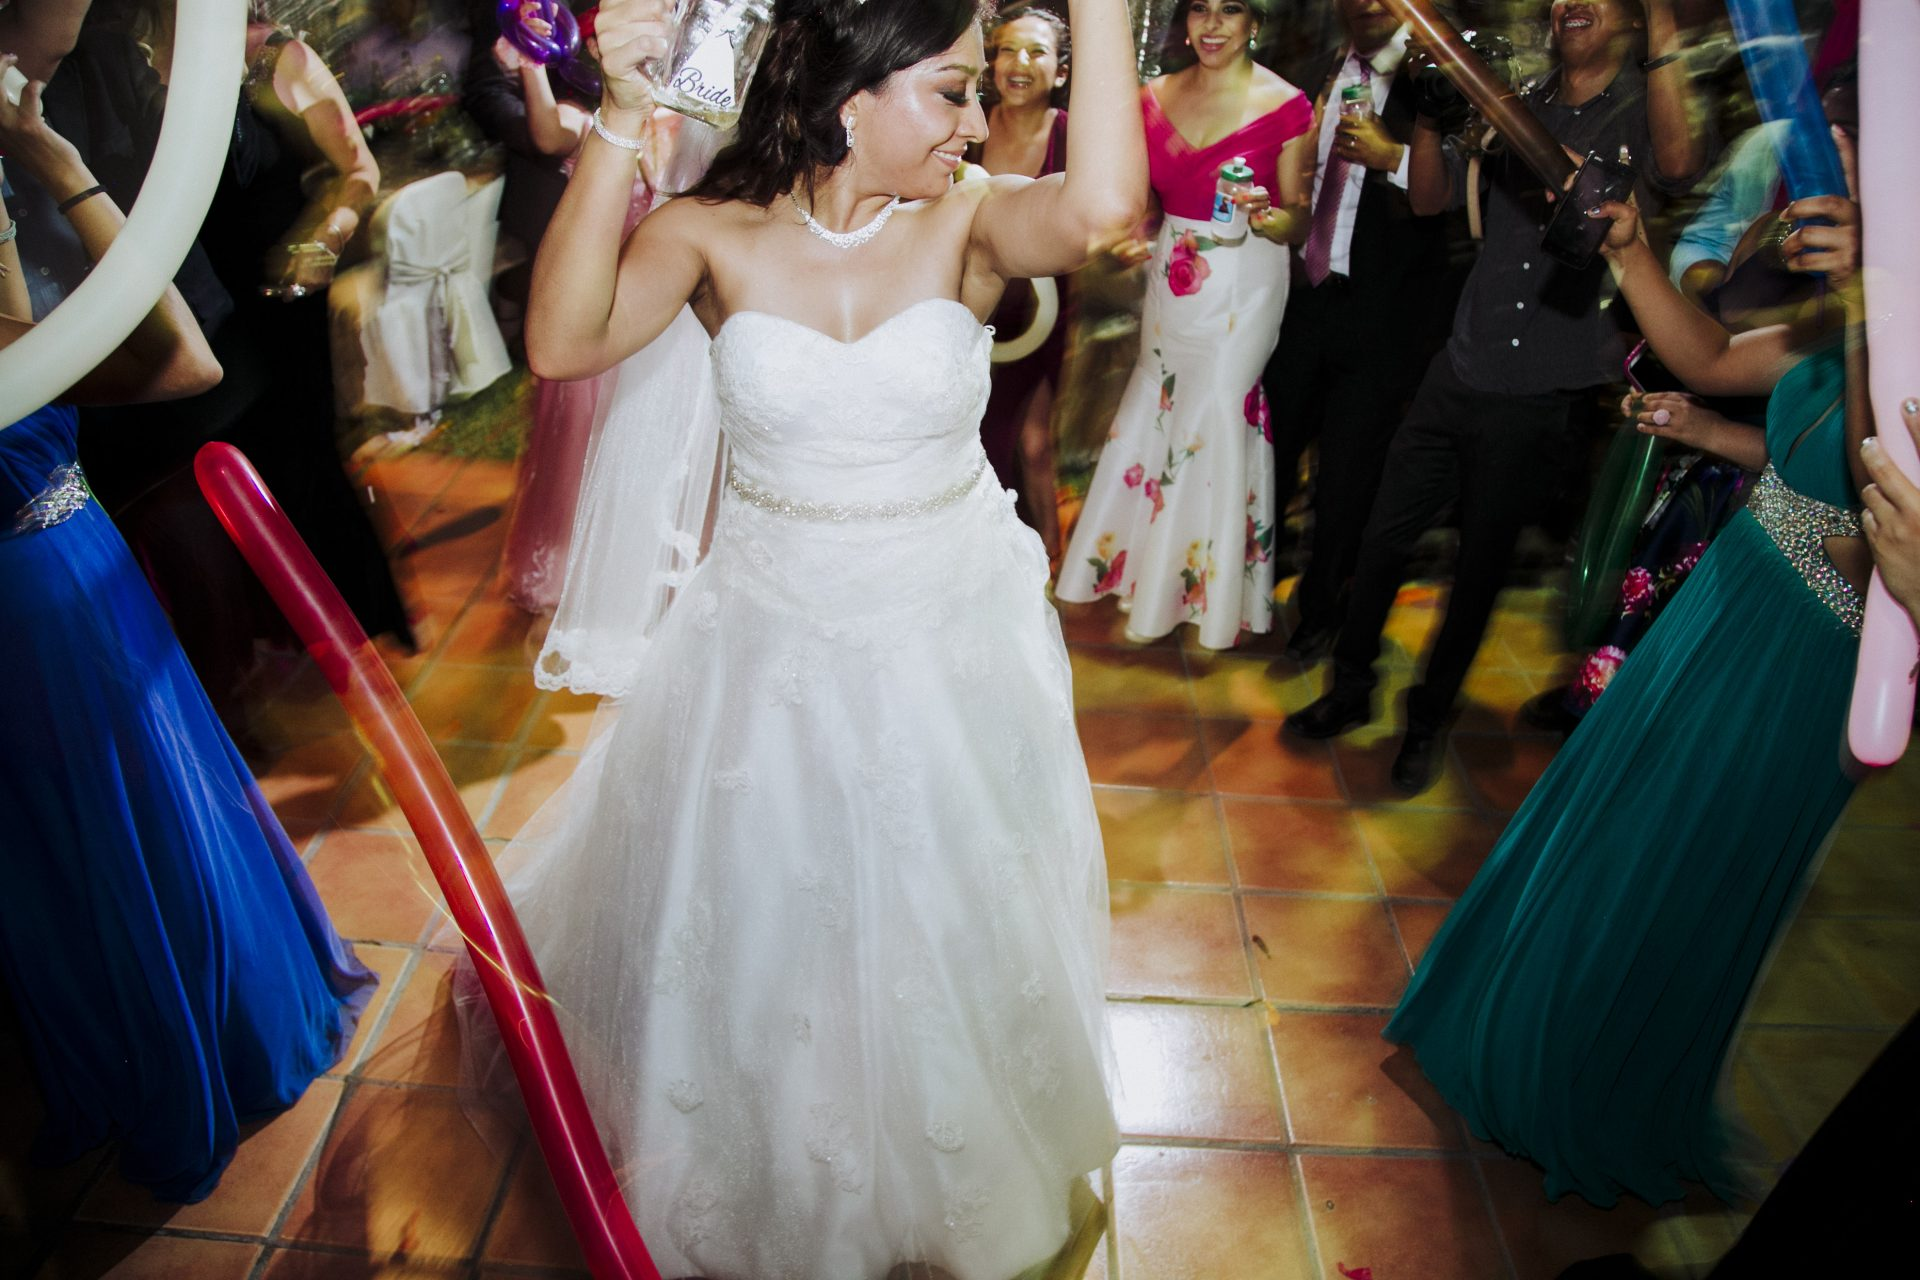 fotografo_profesional_zacatecas_chihuahua_bodas_xv_mexico-68